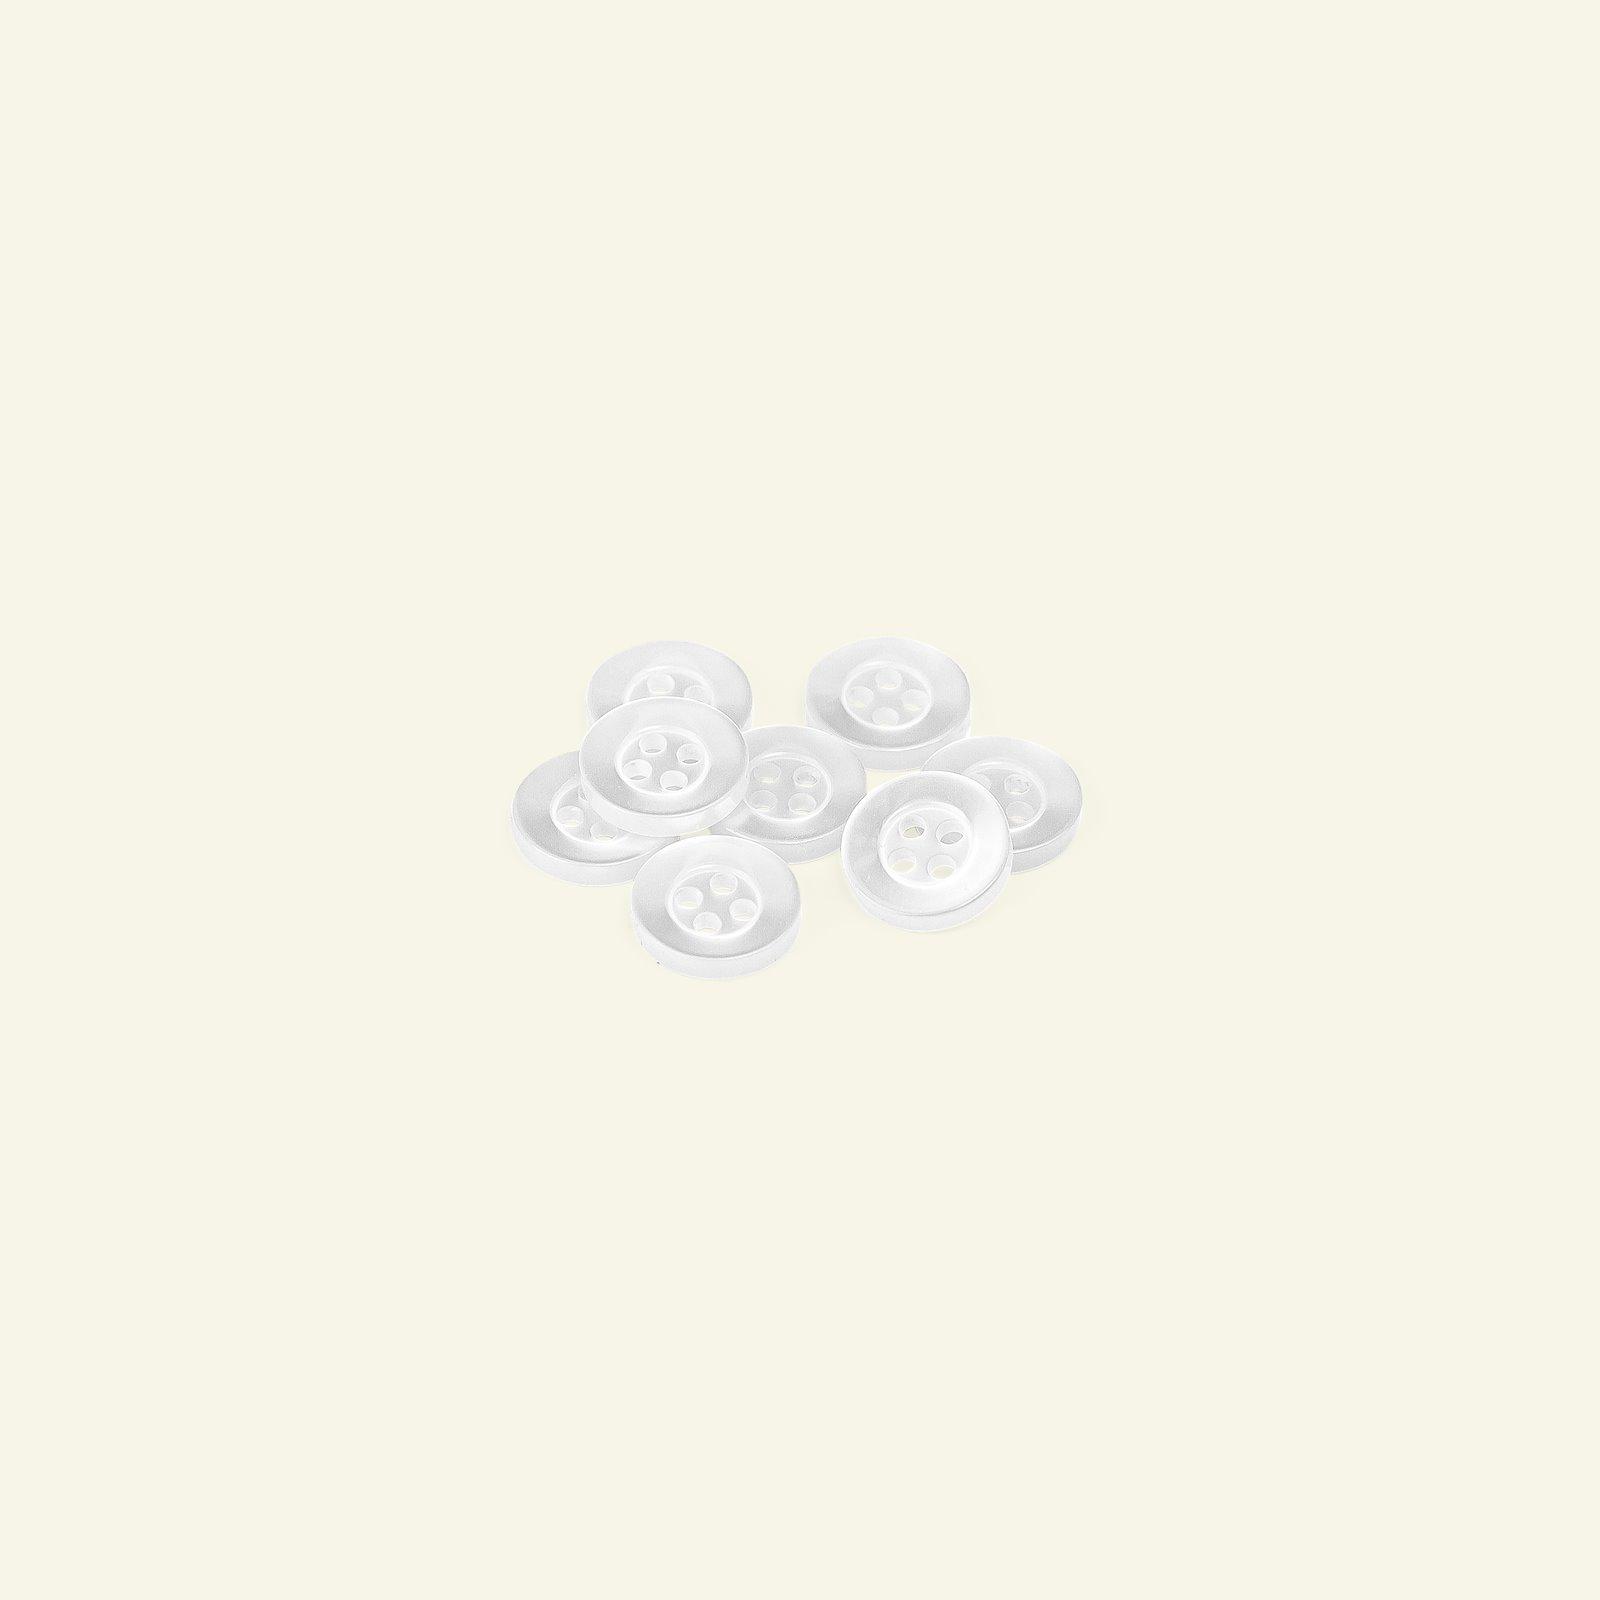 Shirt button 4-holes 12mm white 8pcs 33437_pack